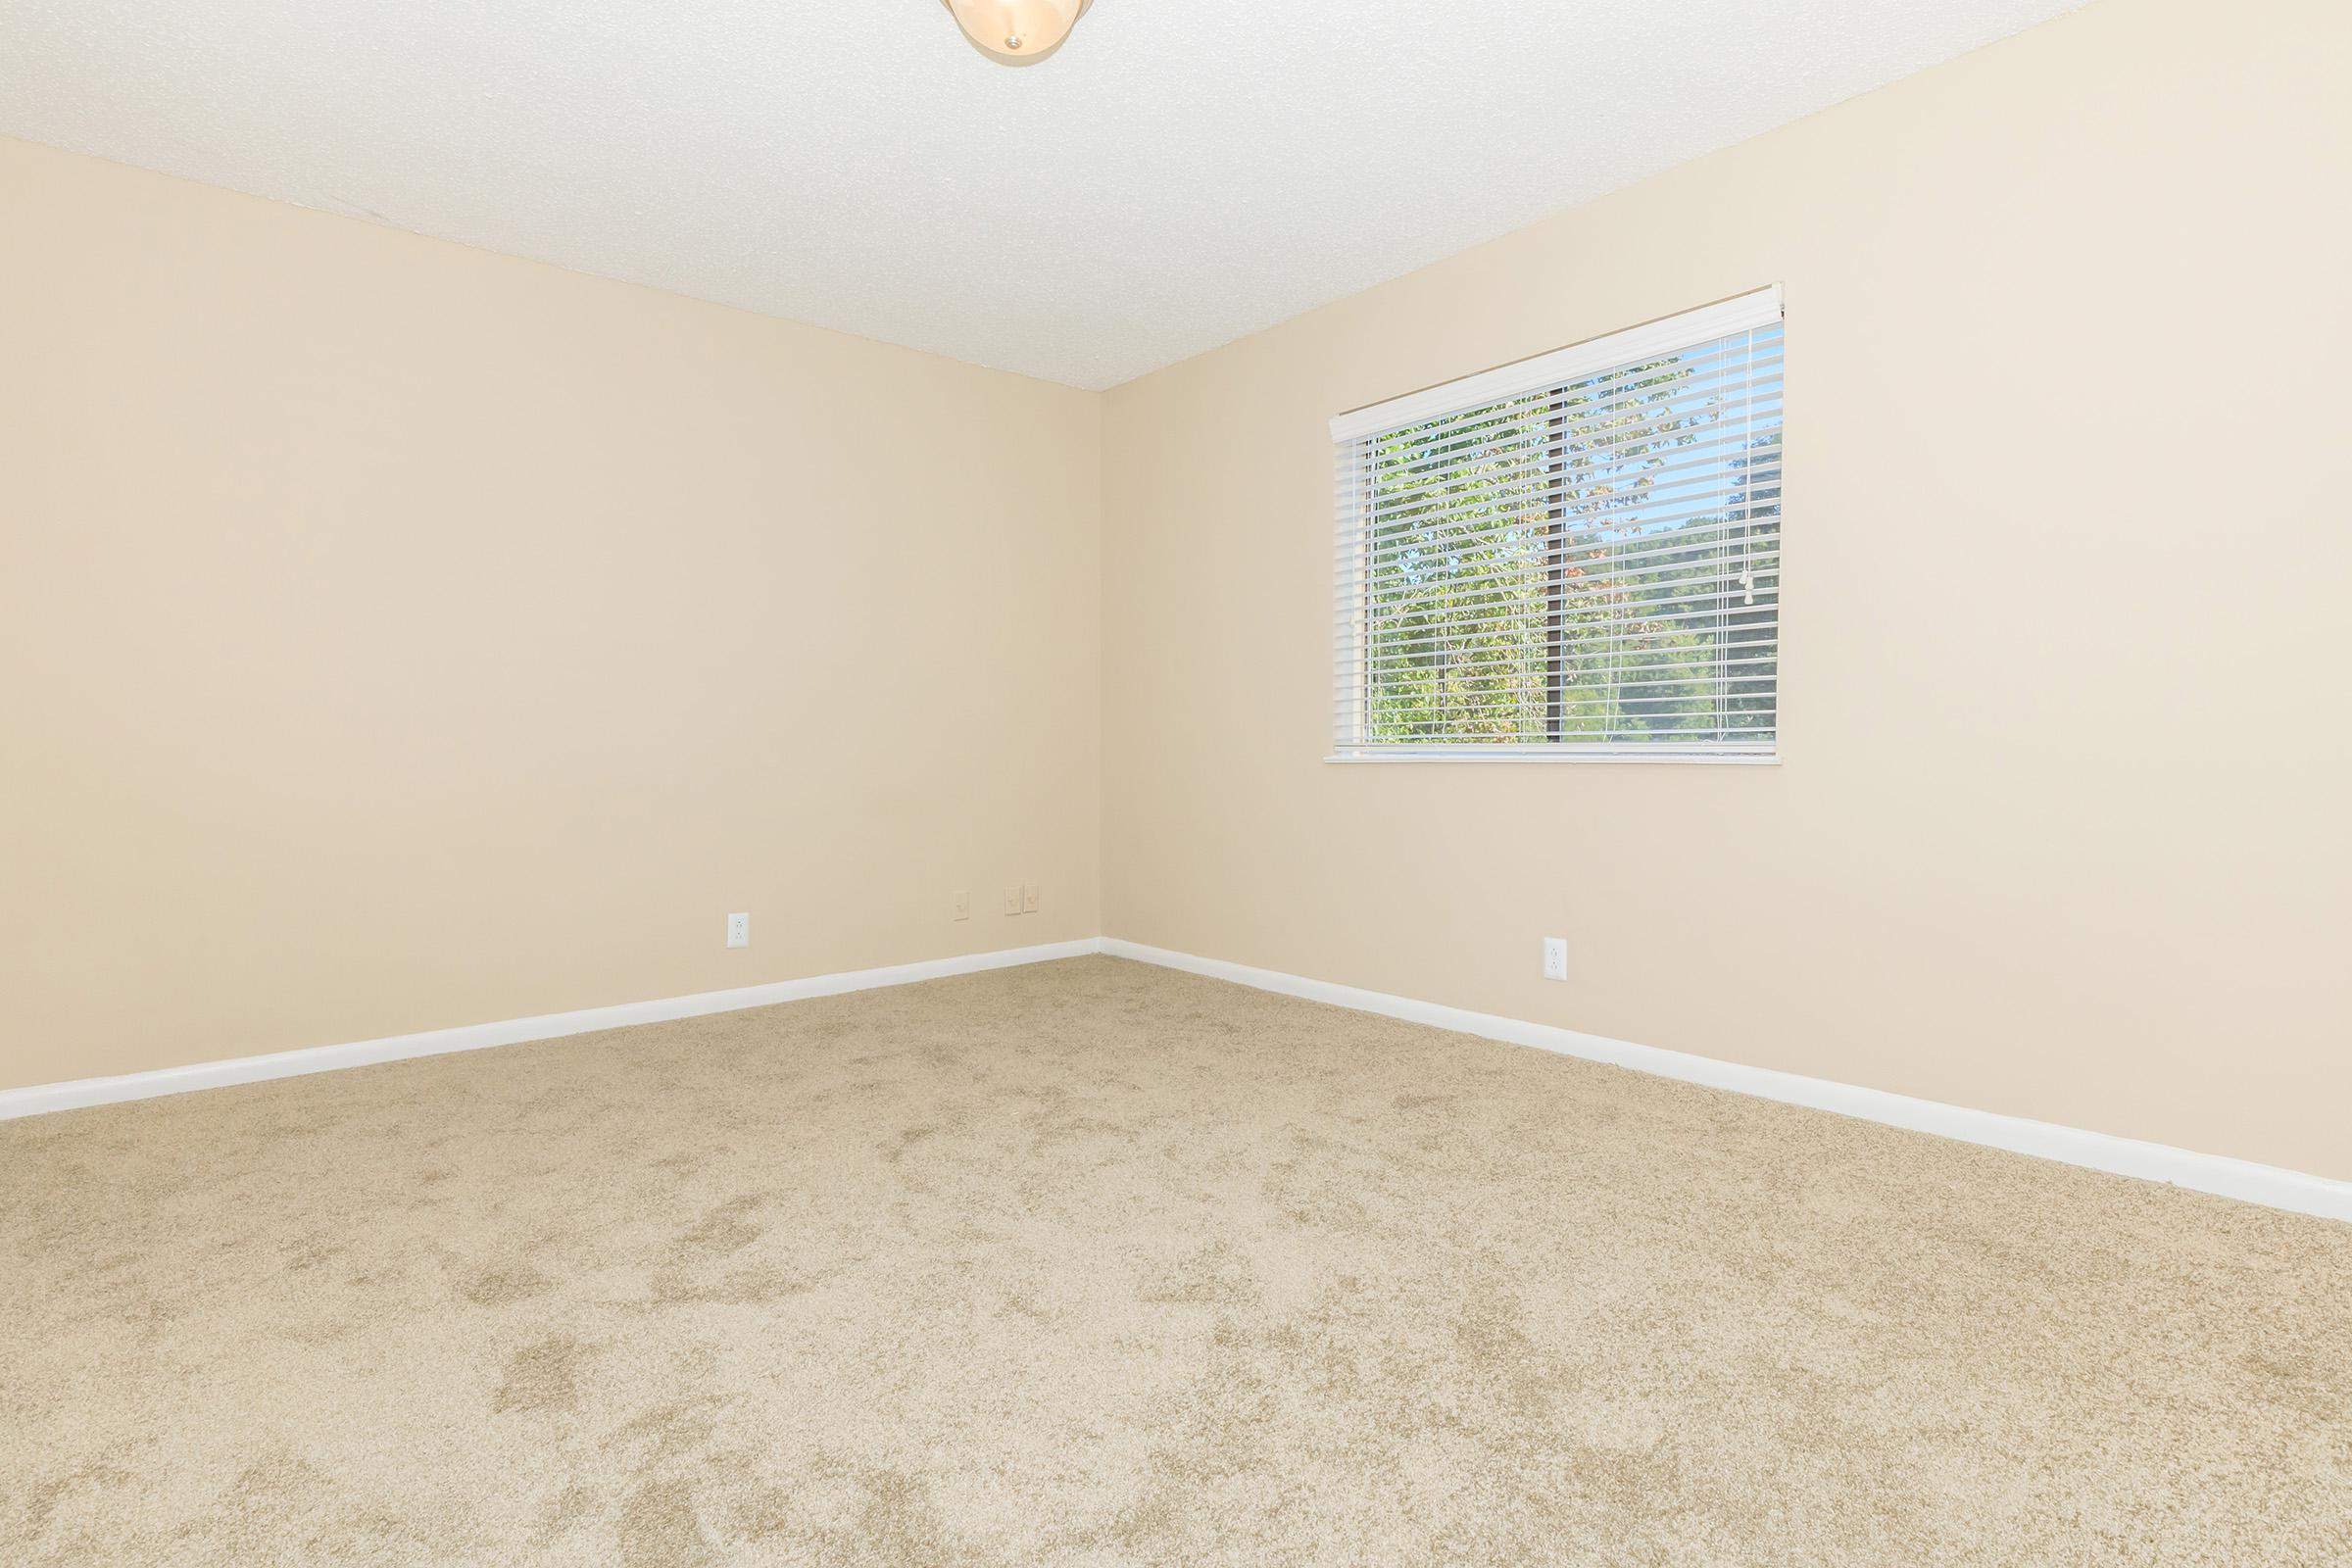 Cozy bedroom with carpet